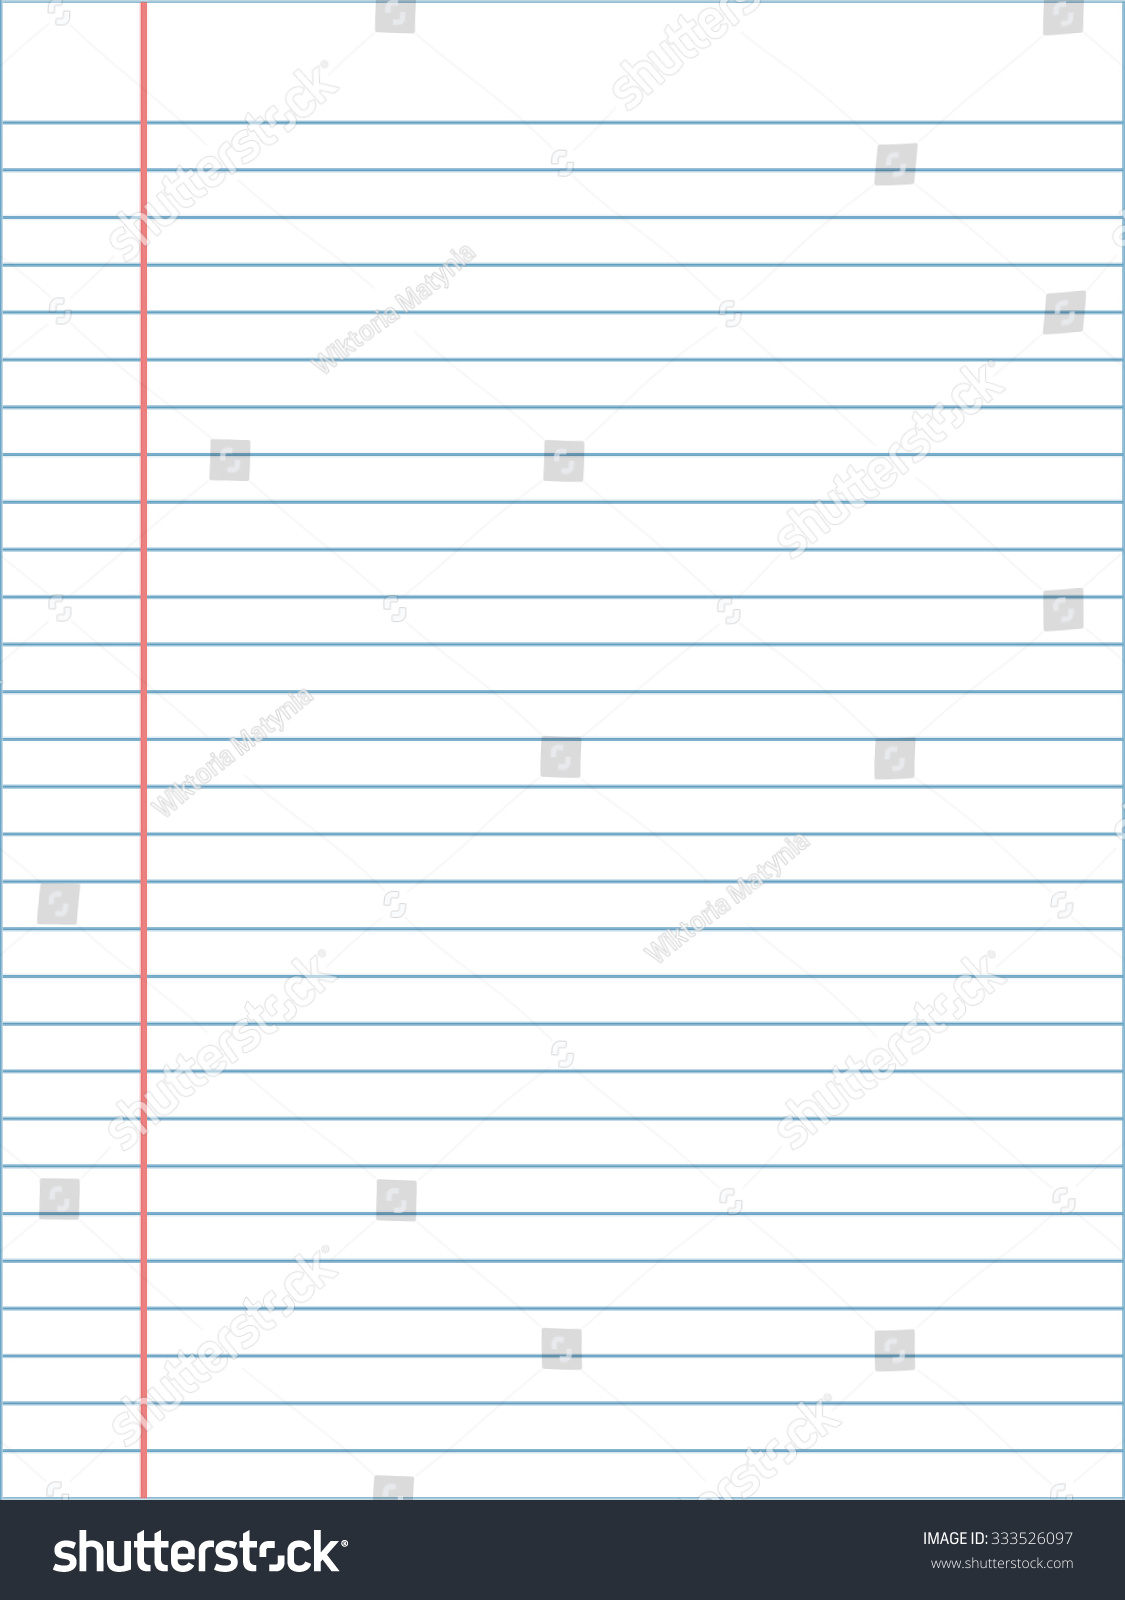 Notebook Page Template Vosvetenet – Word Notebook Paper Template